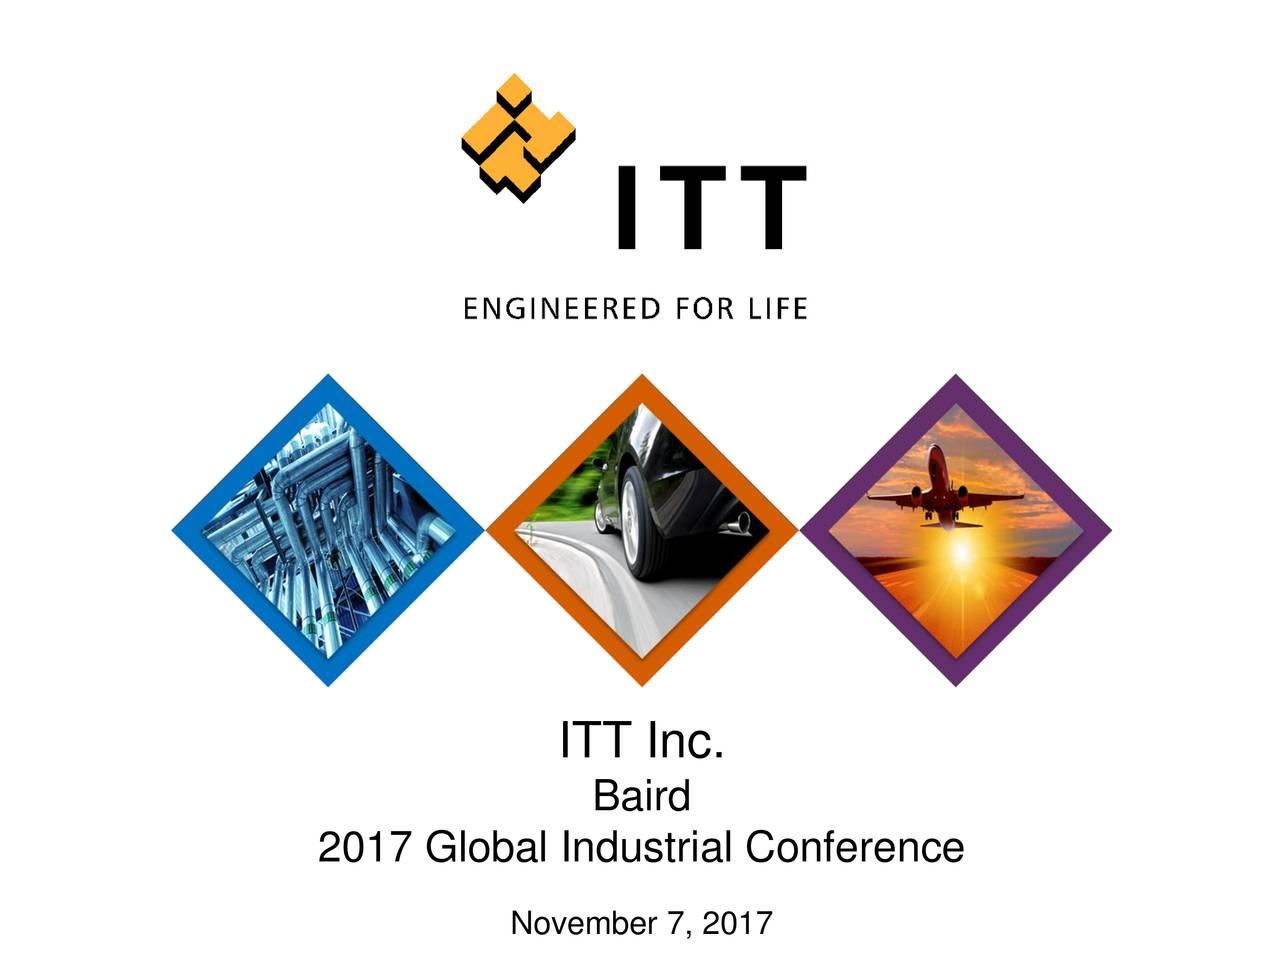 Baird 2017 Global Industrial Conference November 7, 2017